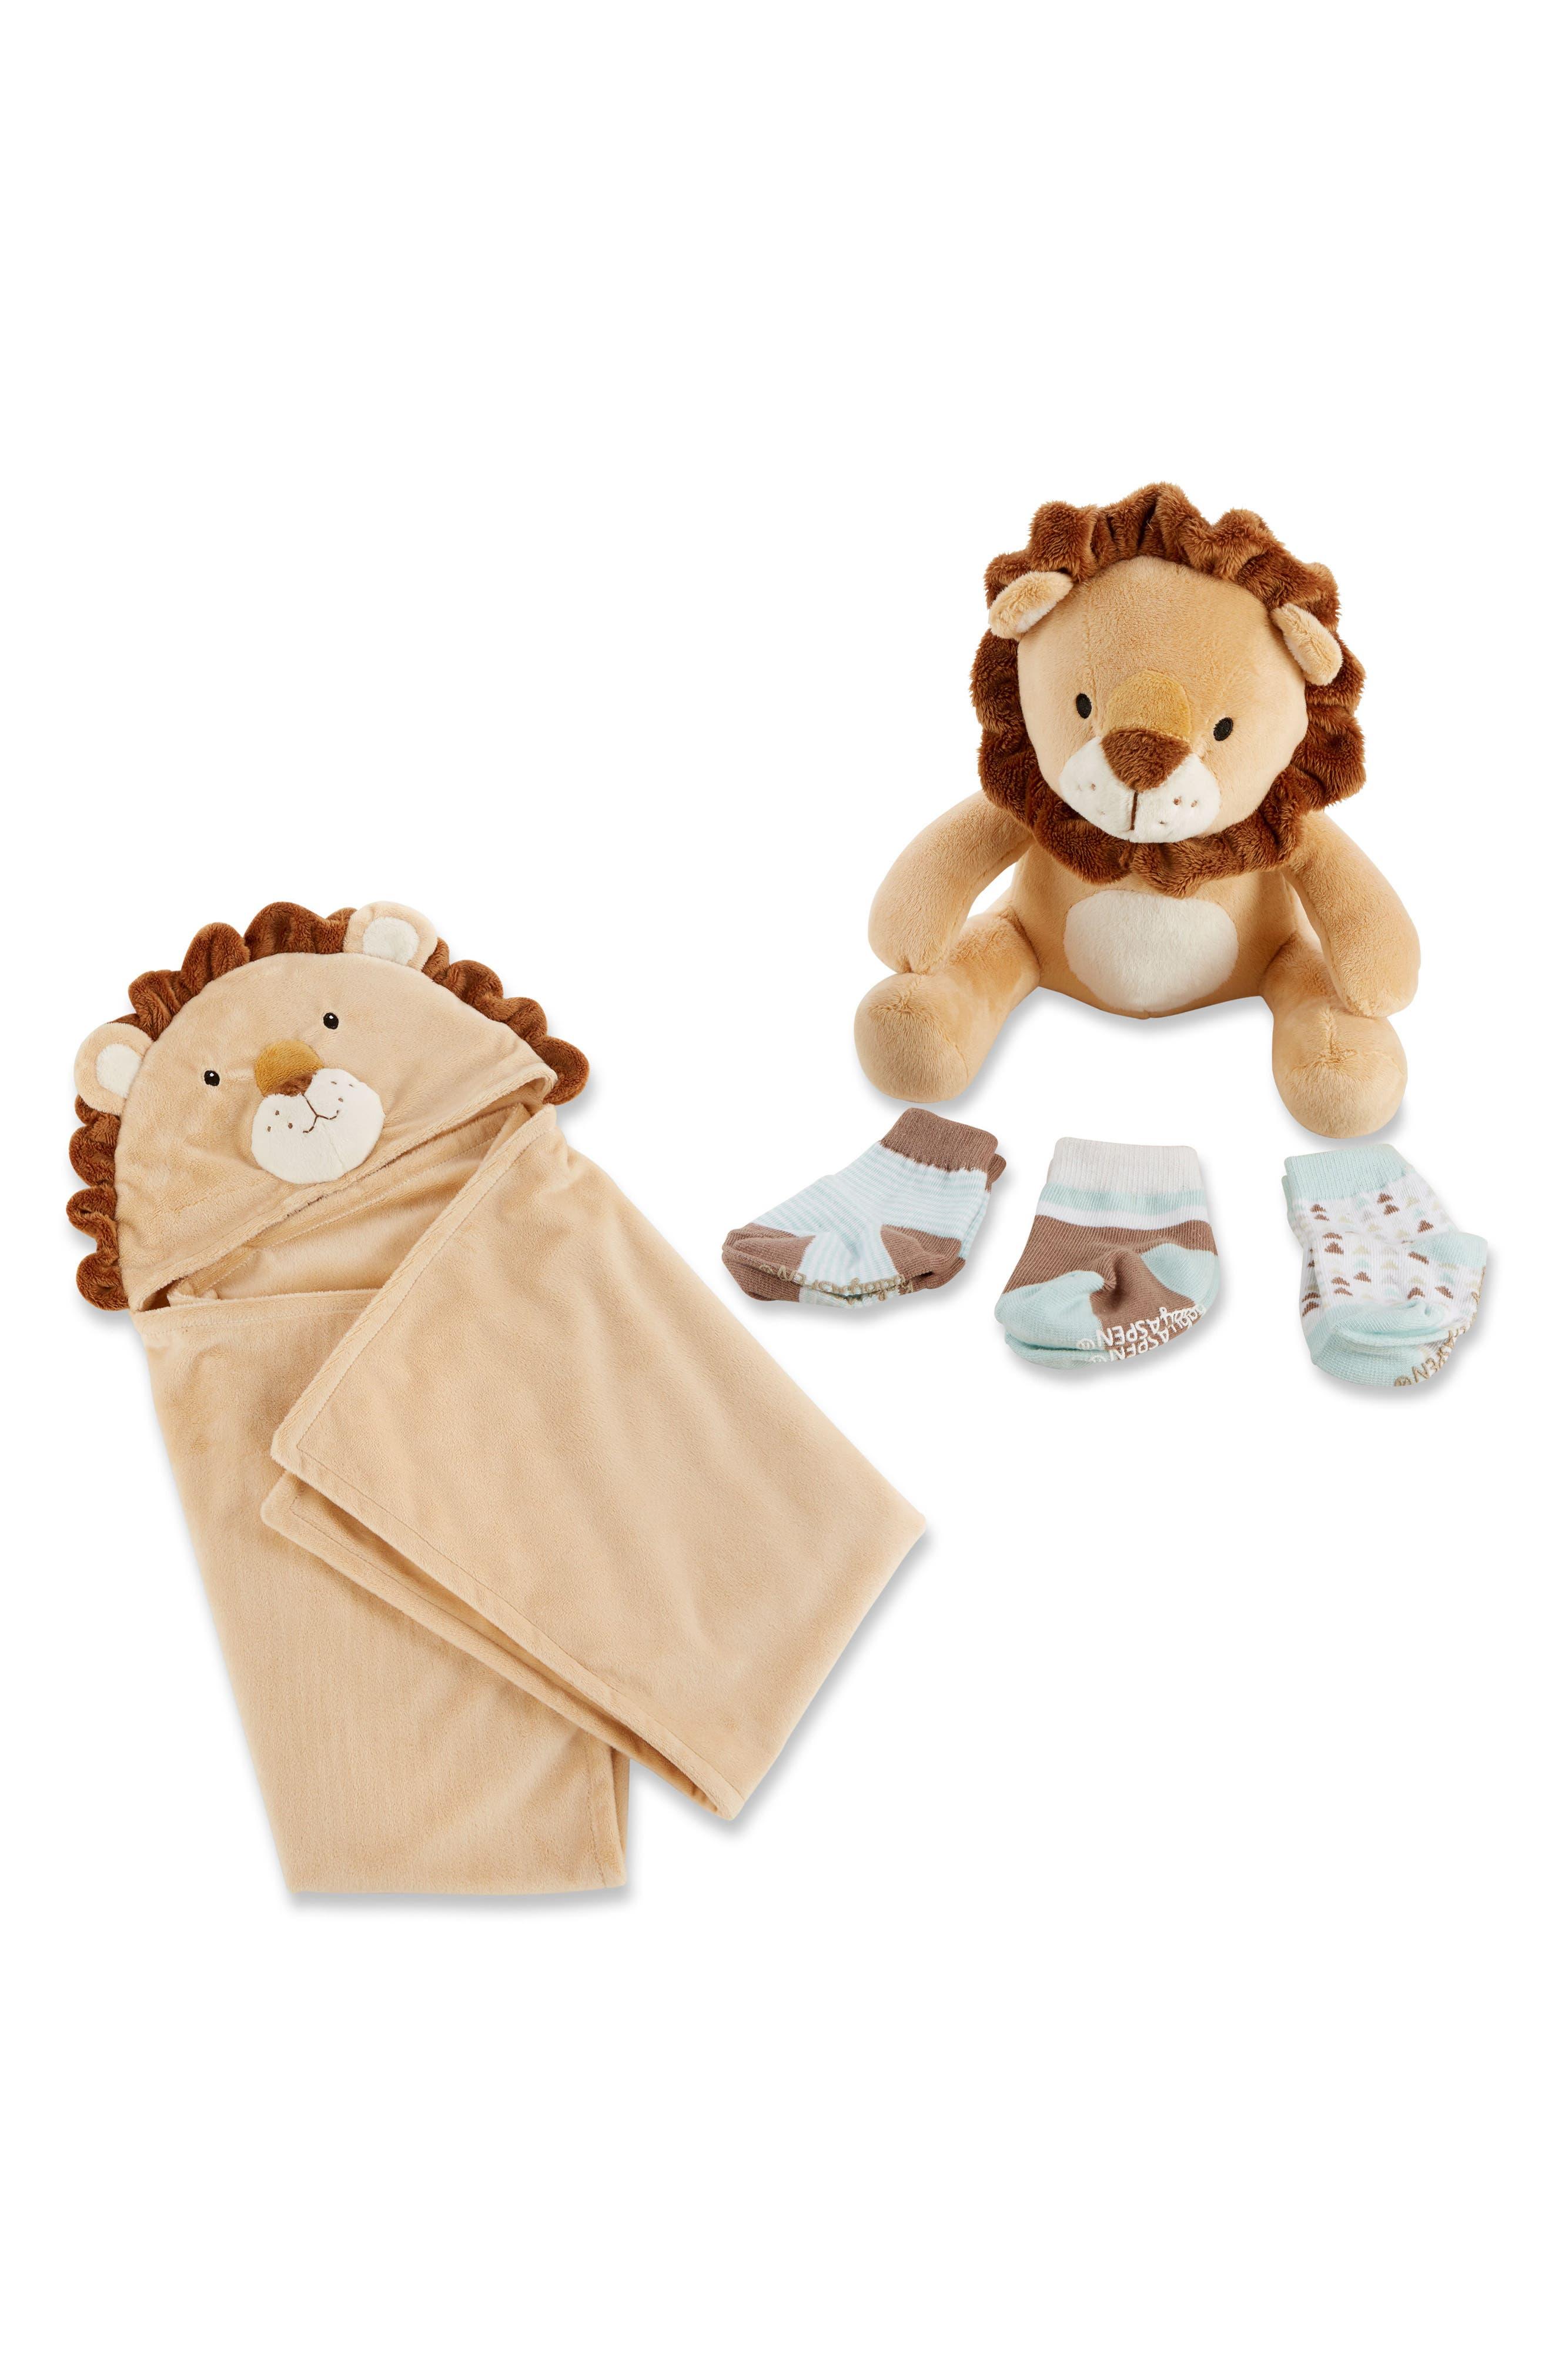 Lion Safari Hooded Blanket, 3-Pack Socks & Stuffed Animal Set,                         Main,                         color, 200